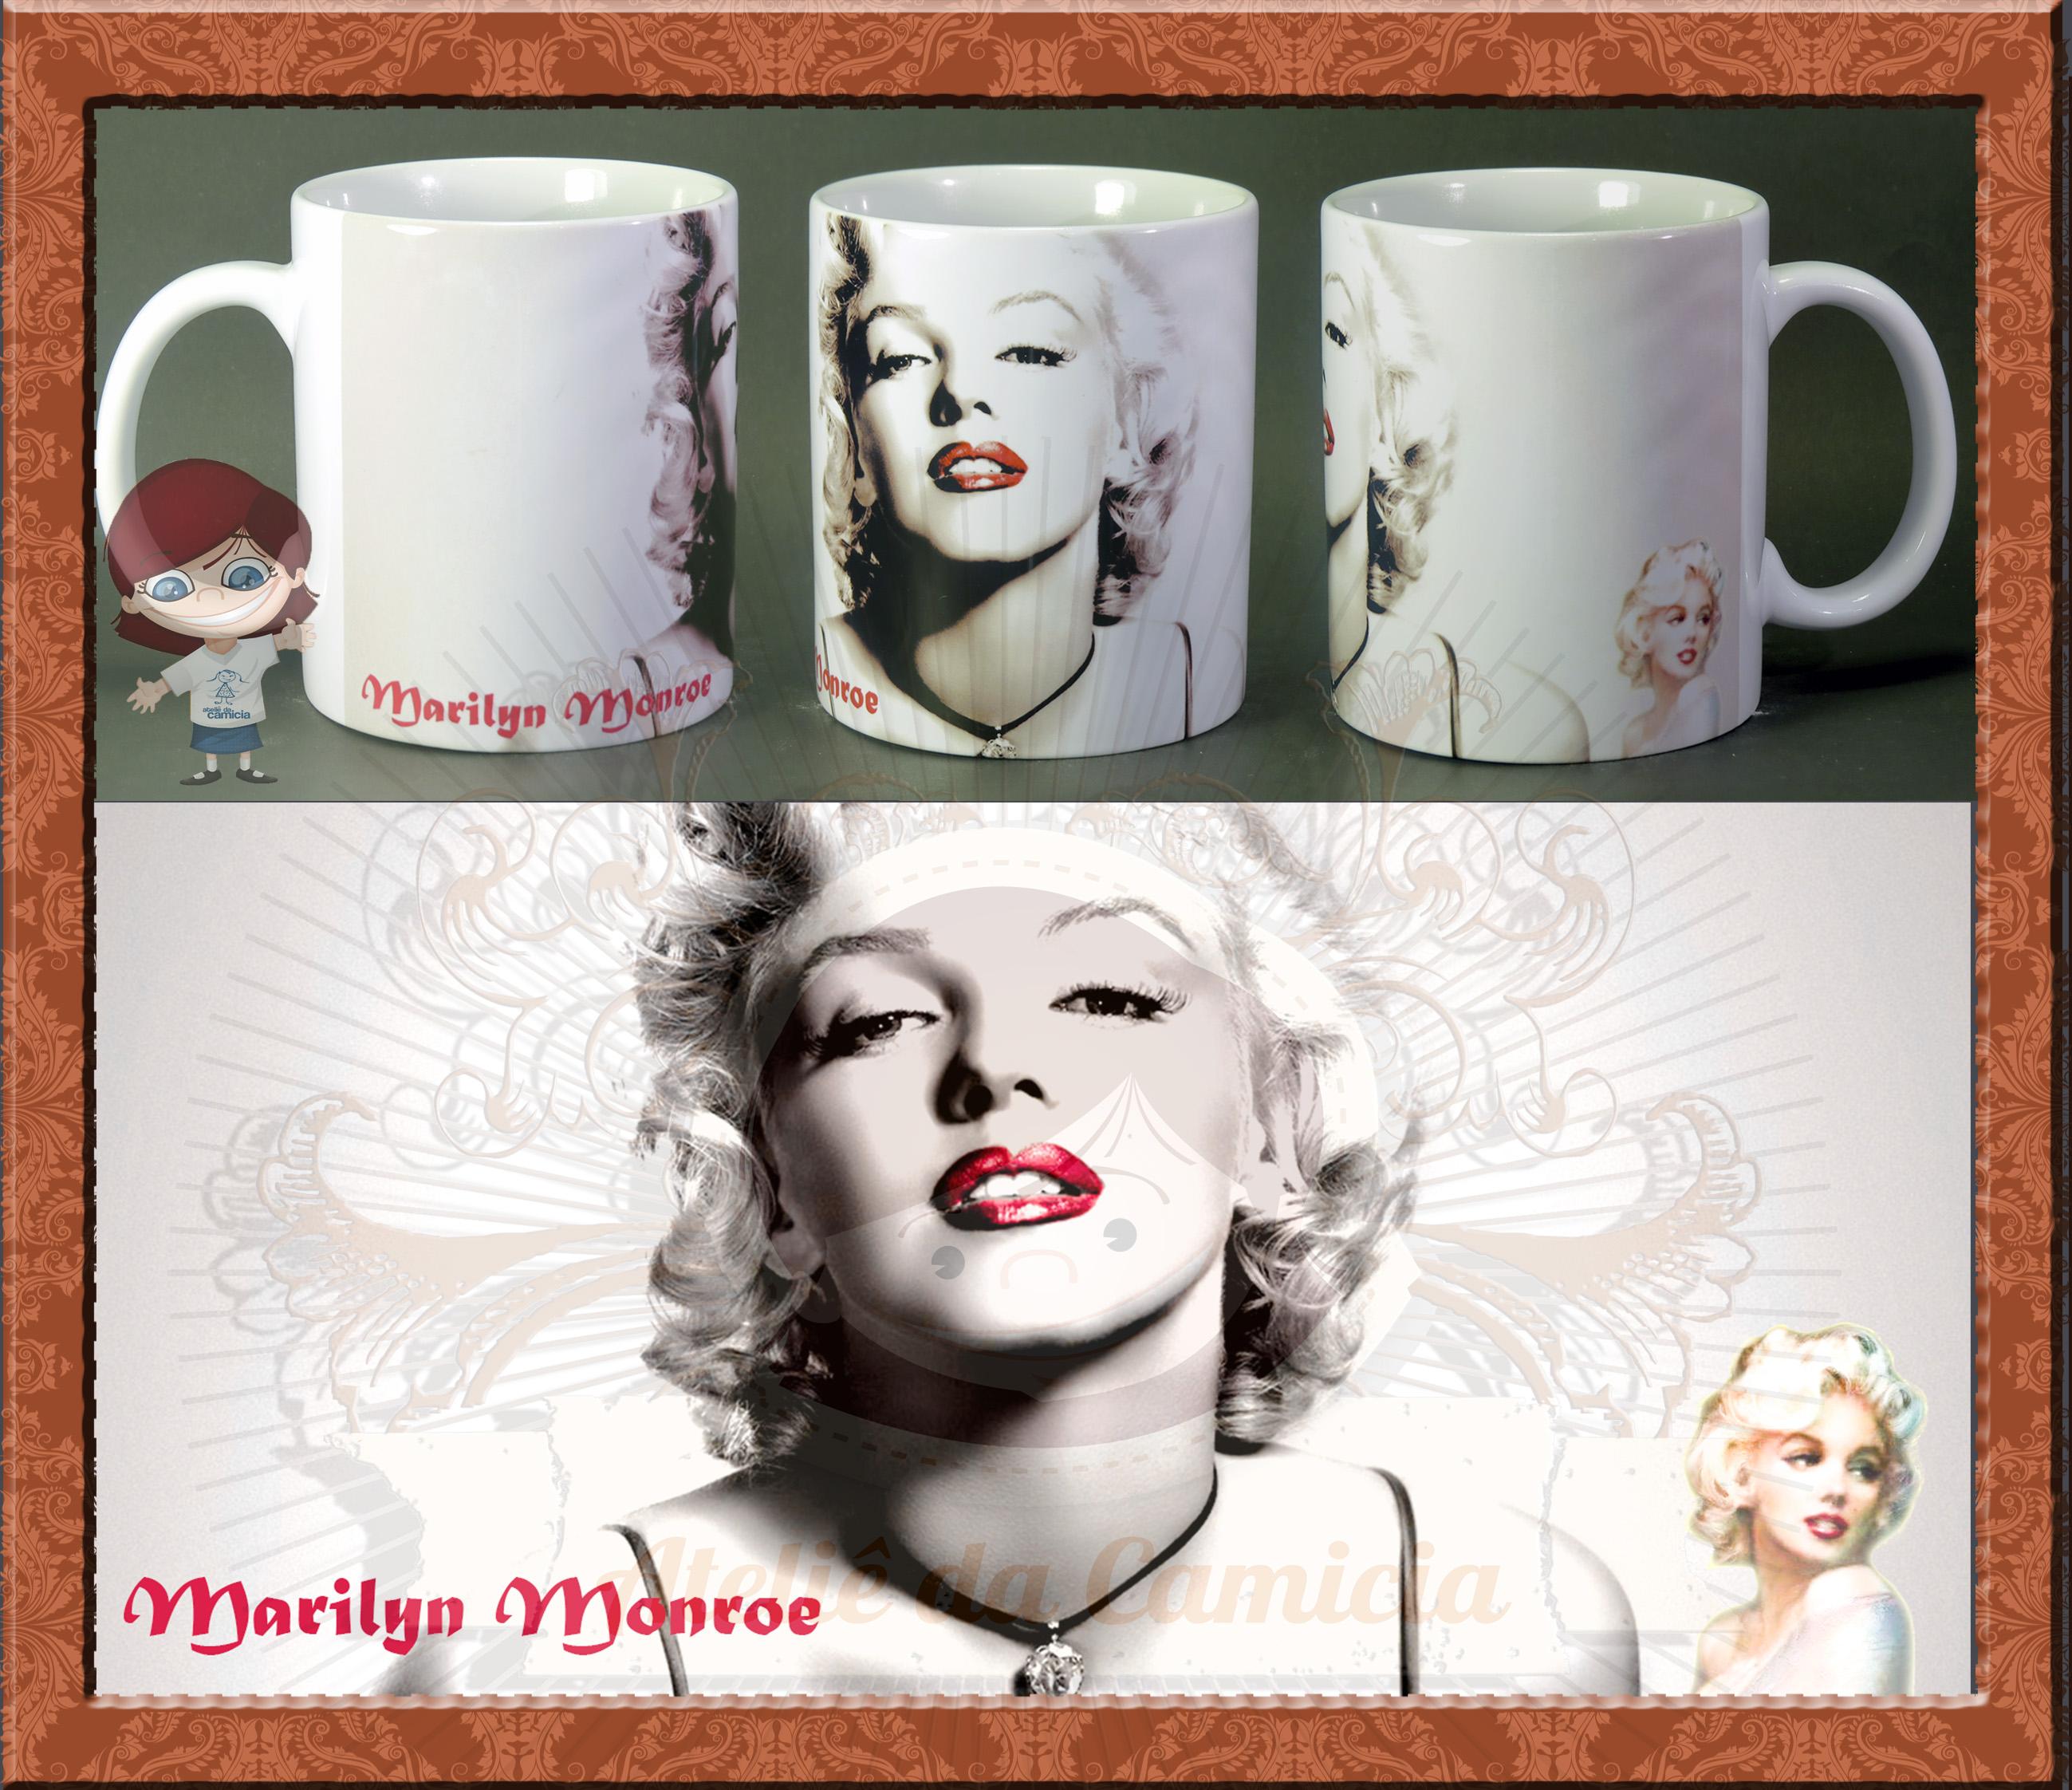 Citaten Marilyn Monroe Itu : Caneca marilyn monroe ateliê da camicia elo